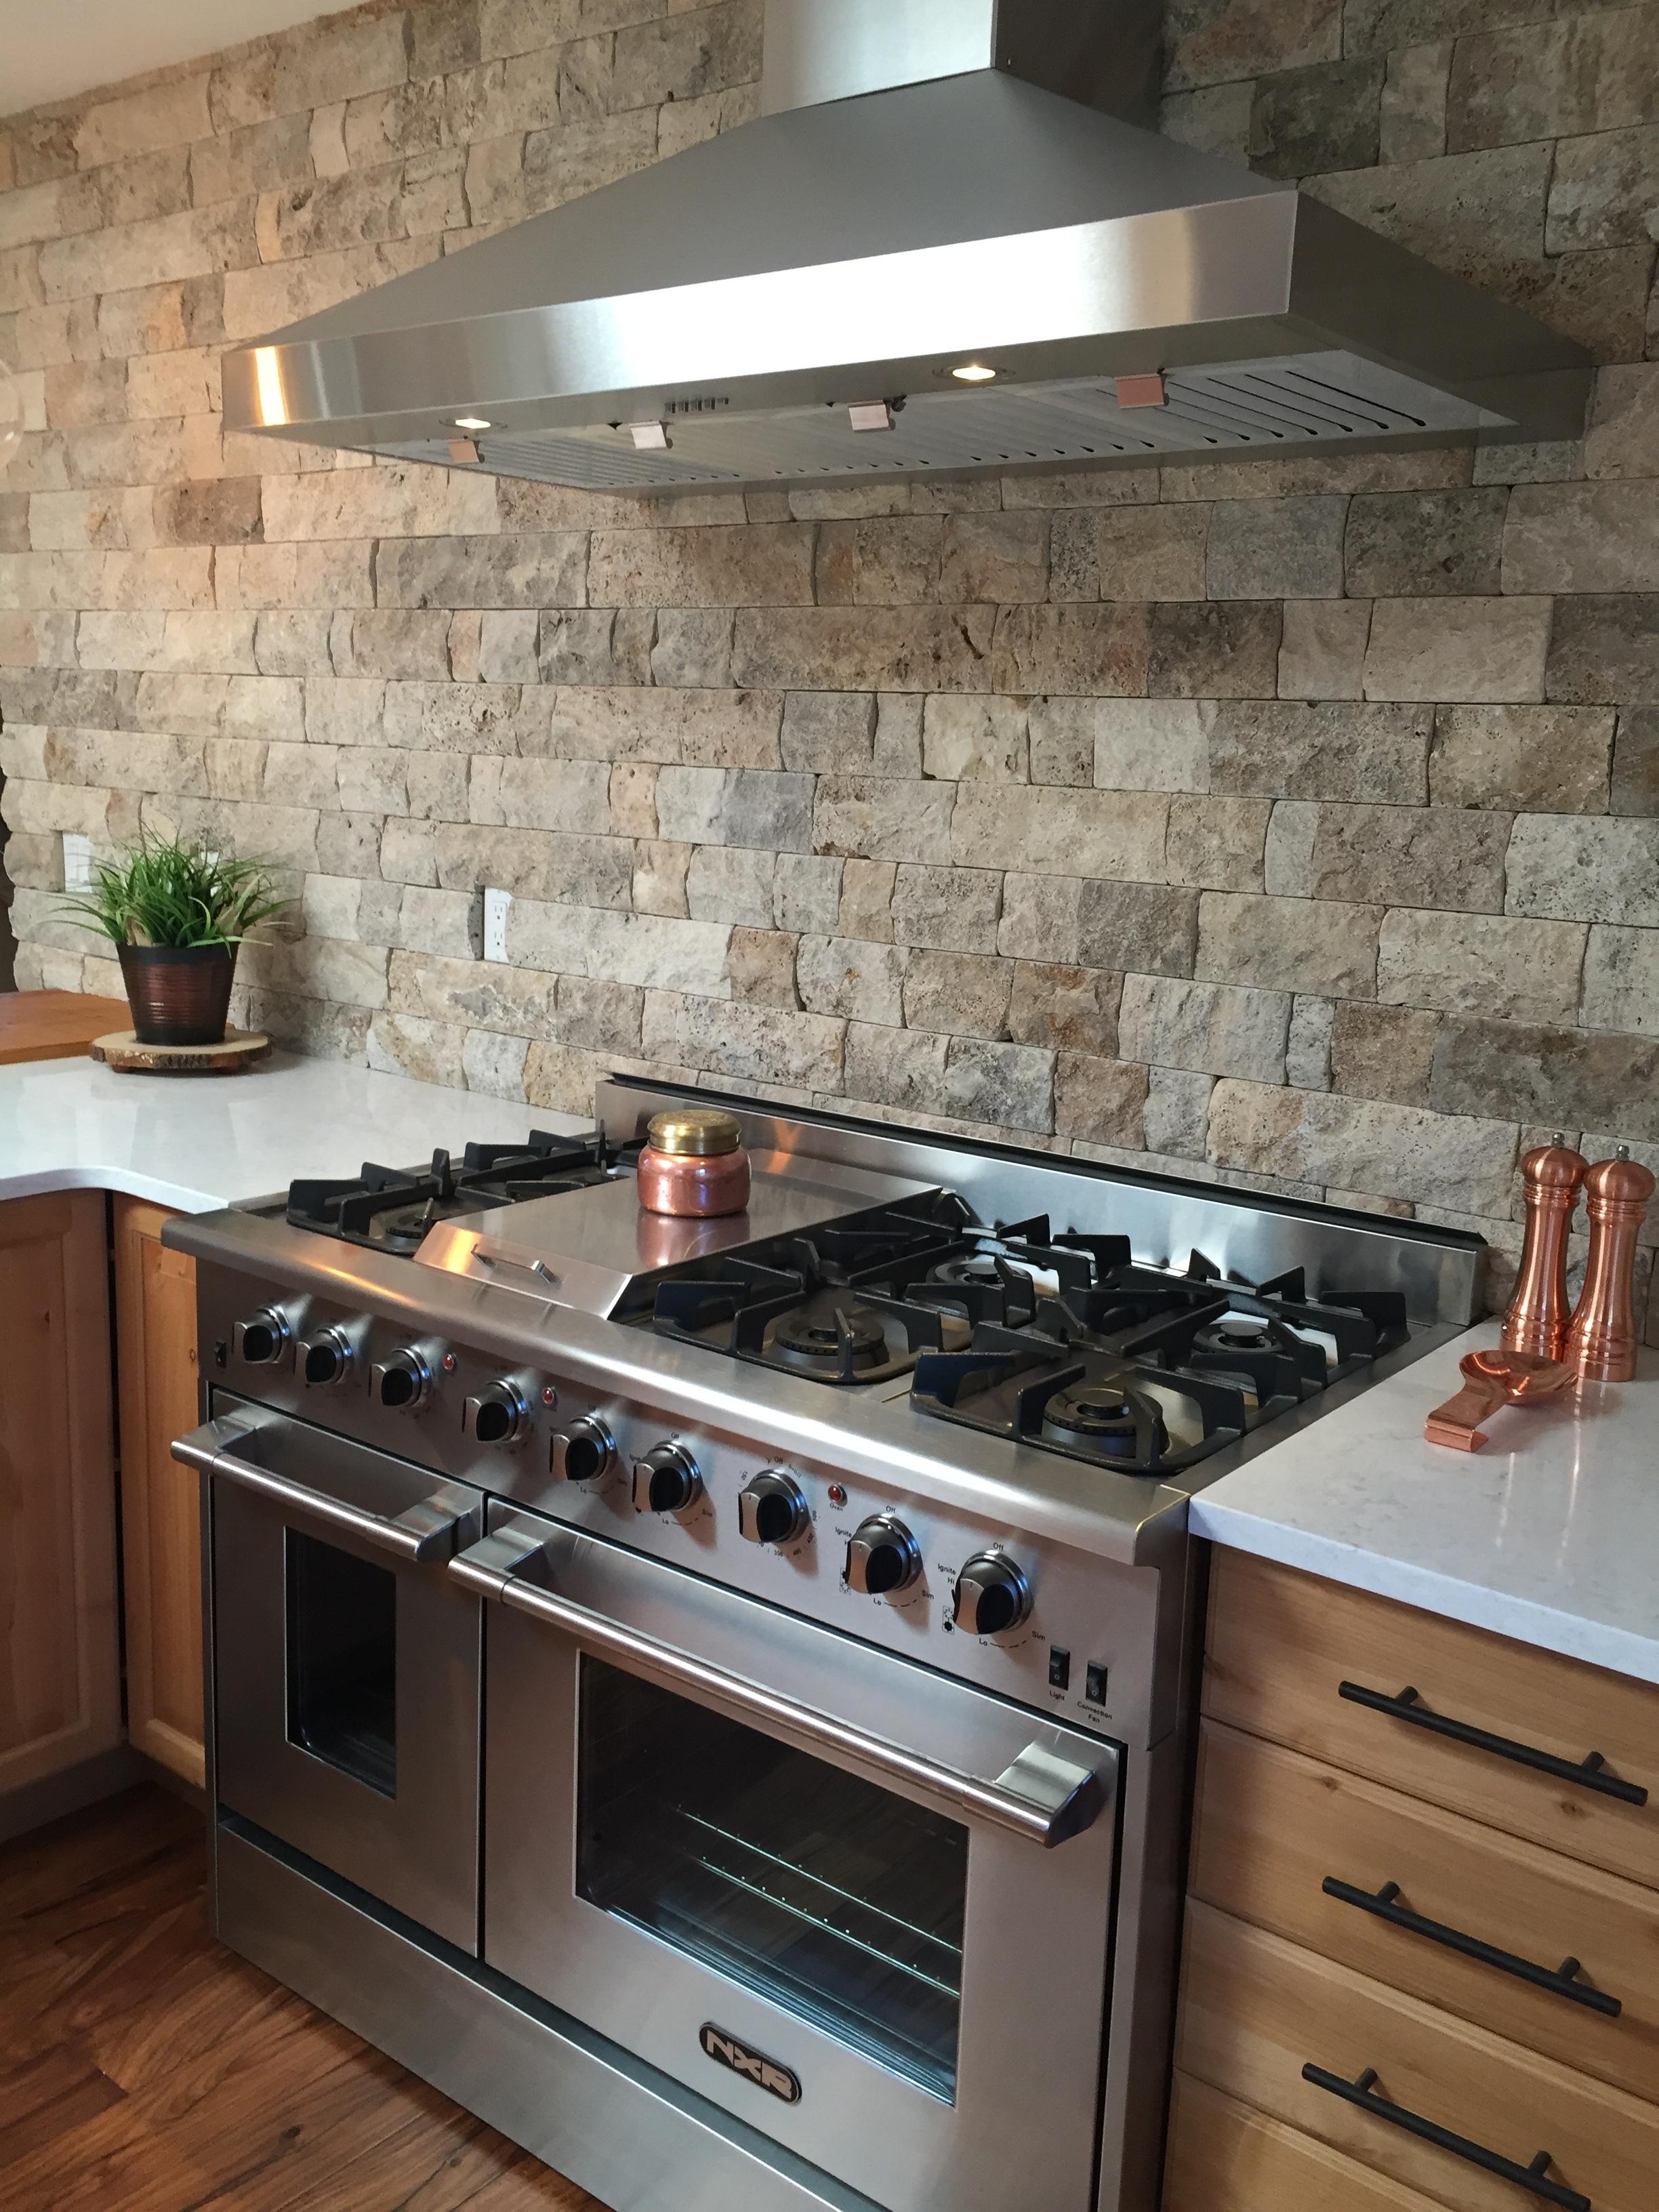 Professional range and hood fan, quartz countertops, rustic stone, Blanchette Slate.